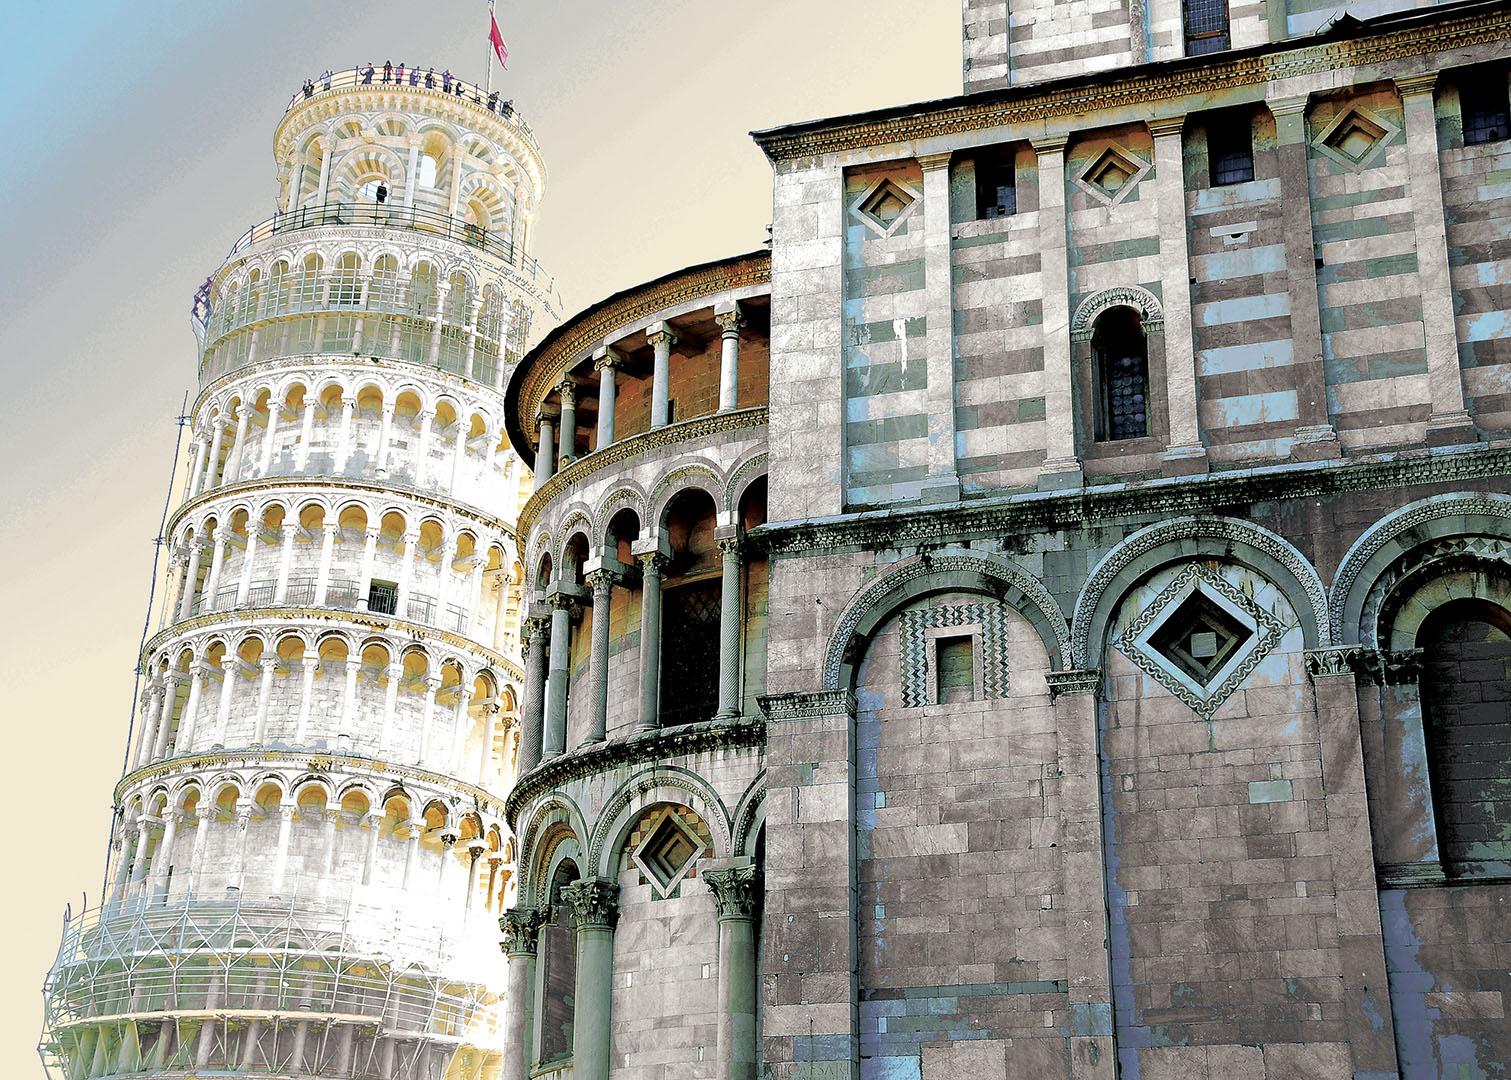 Pisa-Piazza_dei_Miracoli_024_I08-10.76